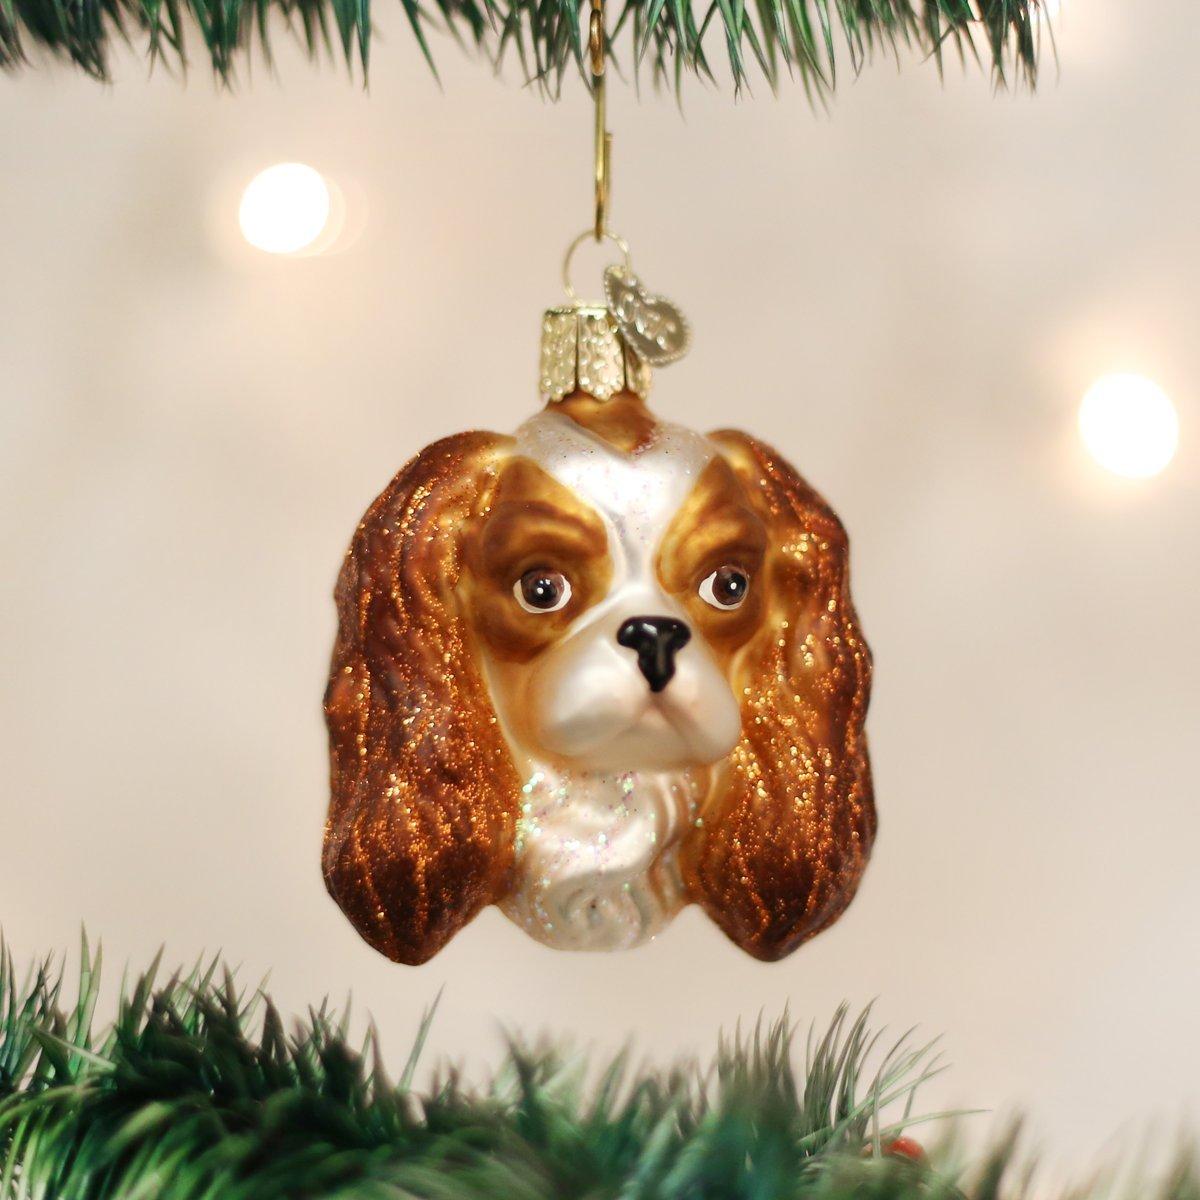 Old World Christmas King Charles Spaniel Head Glass Blown Ornament